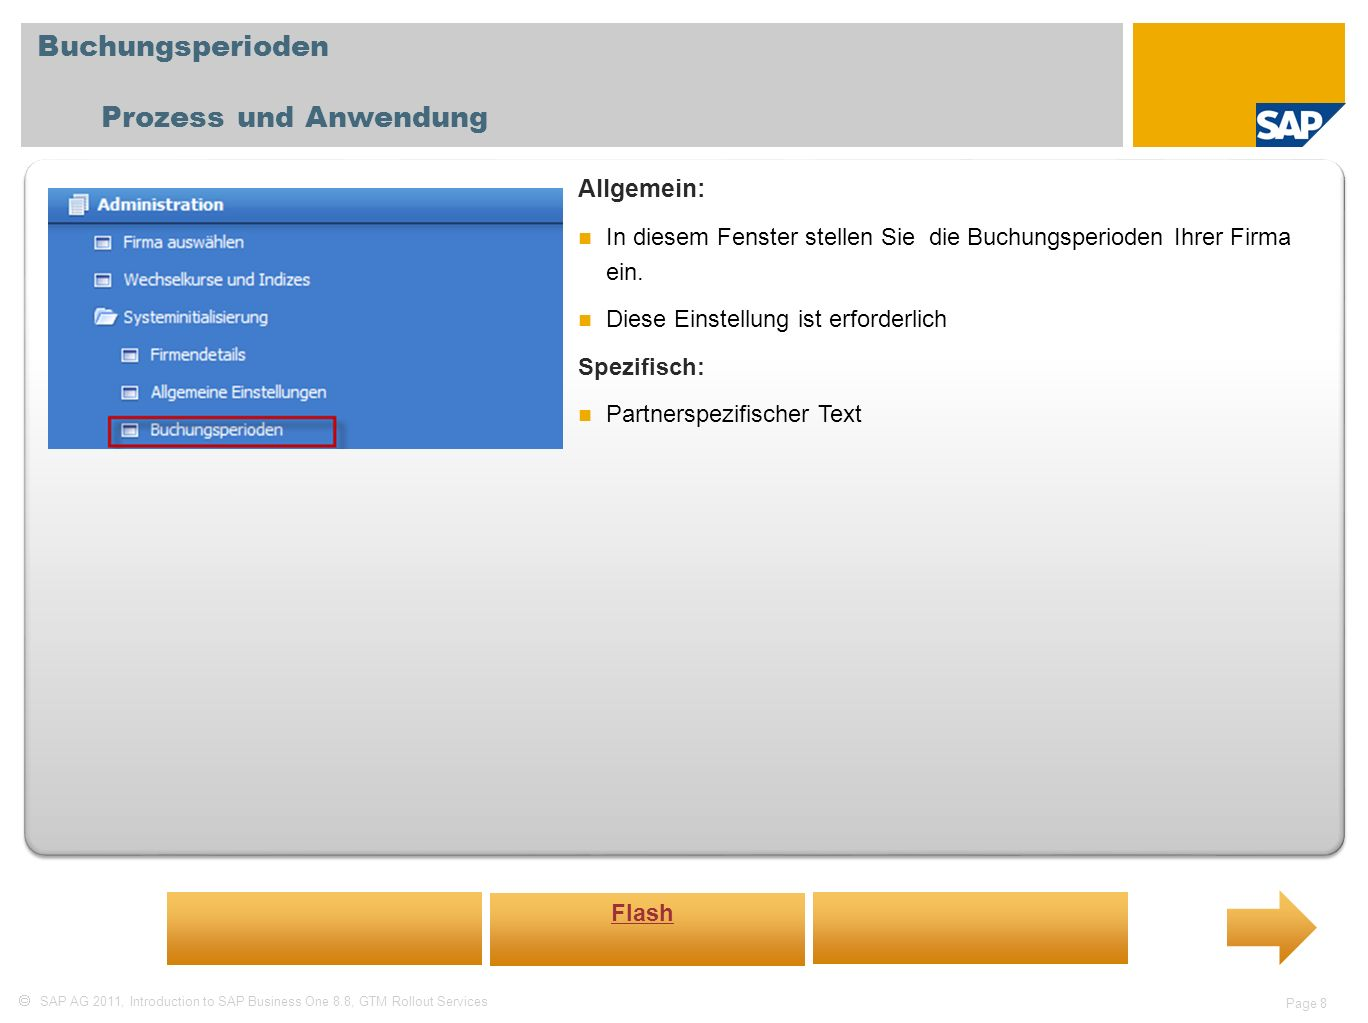 SAP AG 2011, Introduction to SAP Business One 8.8, GTM Rollout Services Page 8 Buchungsperioden Prozess und Anwendung Allgemein: In diesem Fenster ste